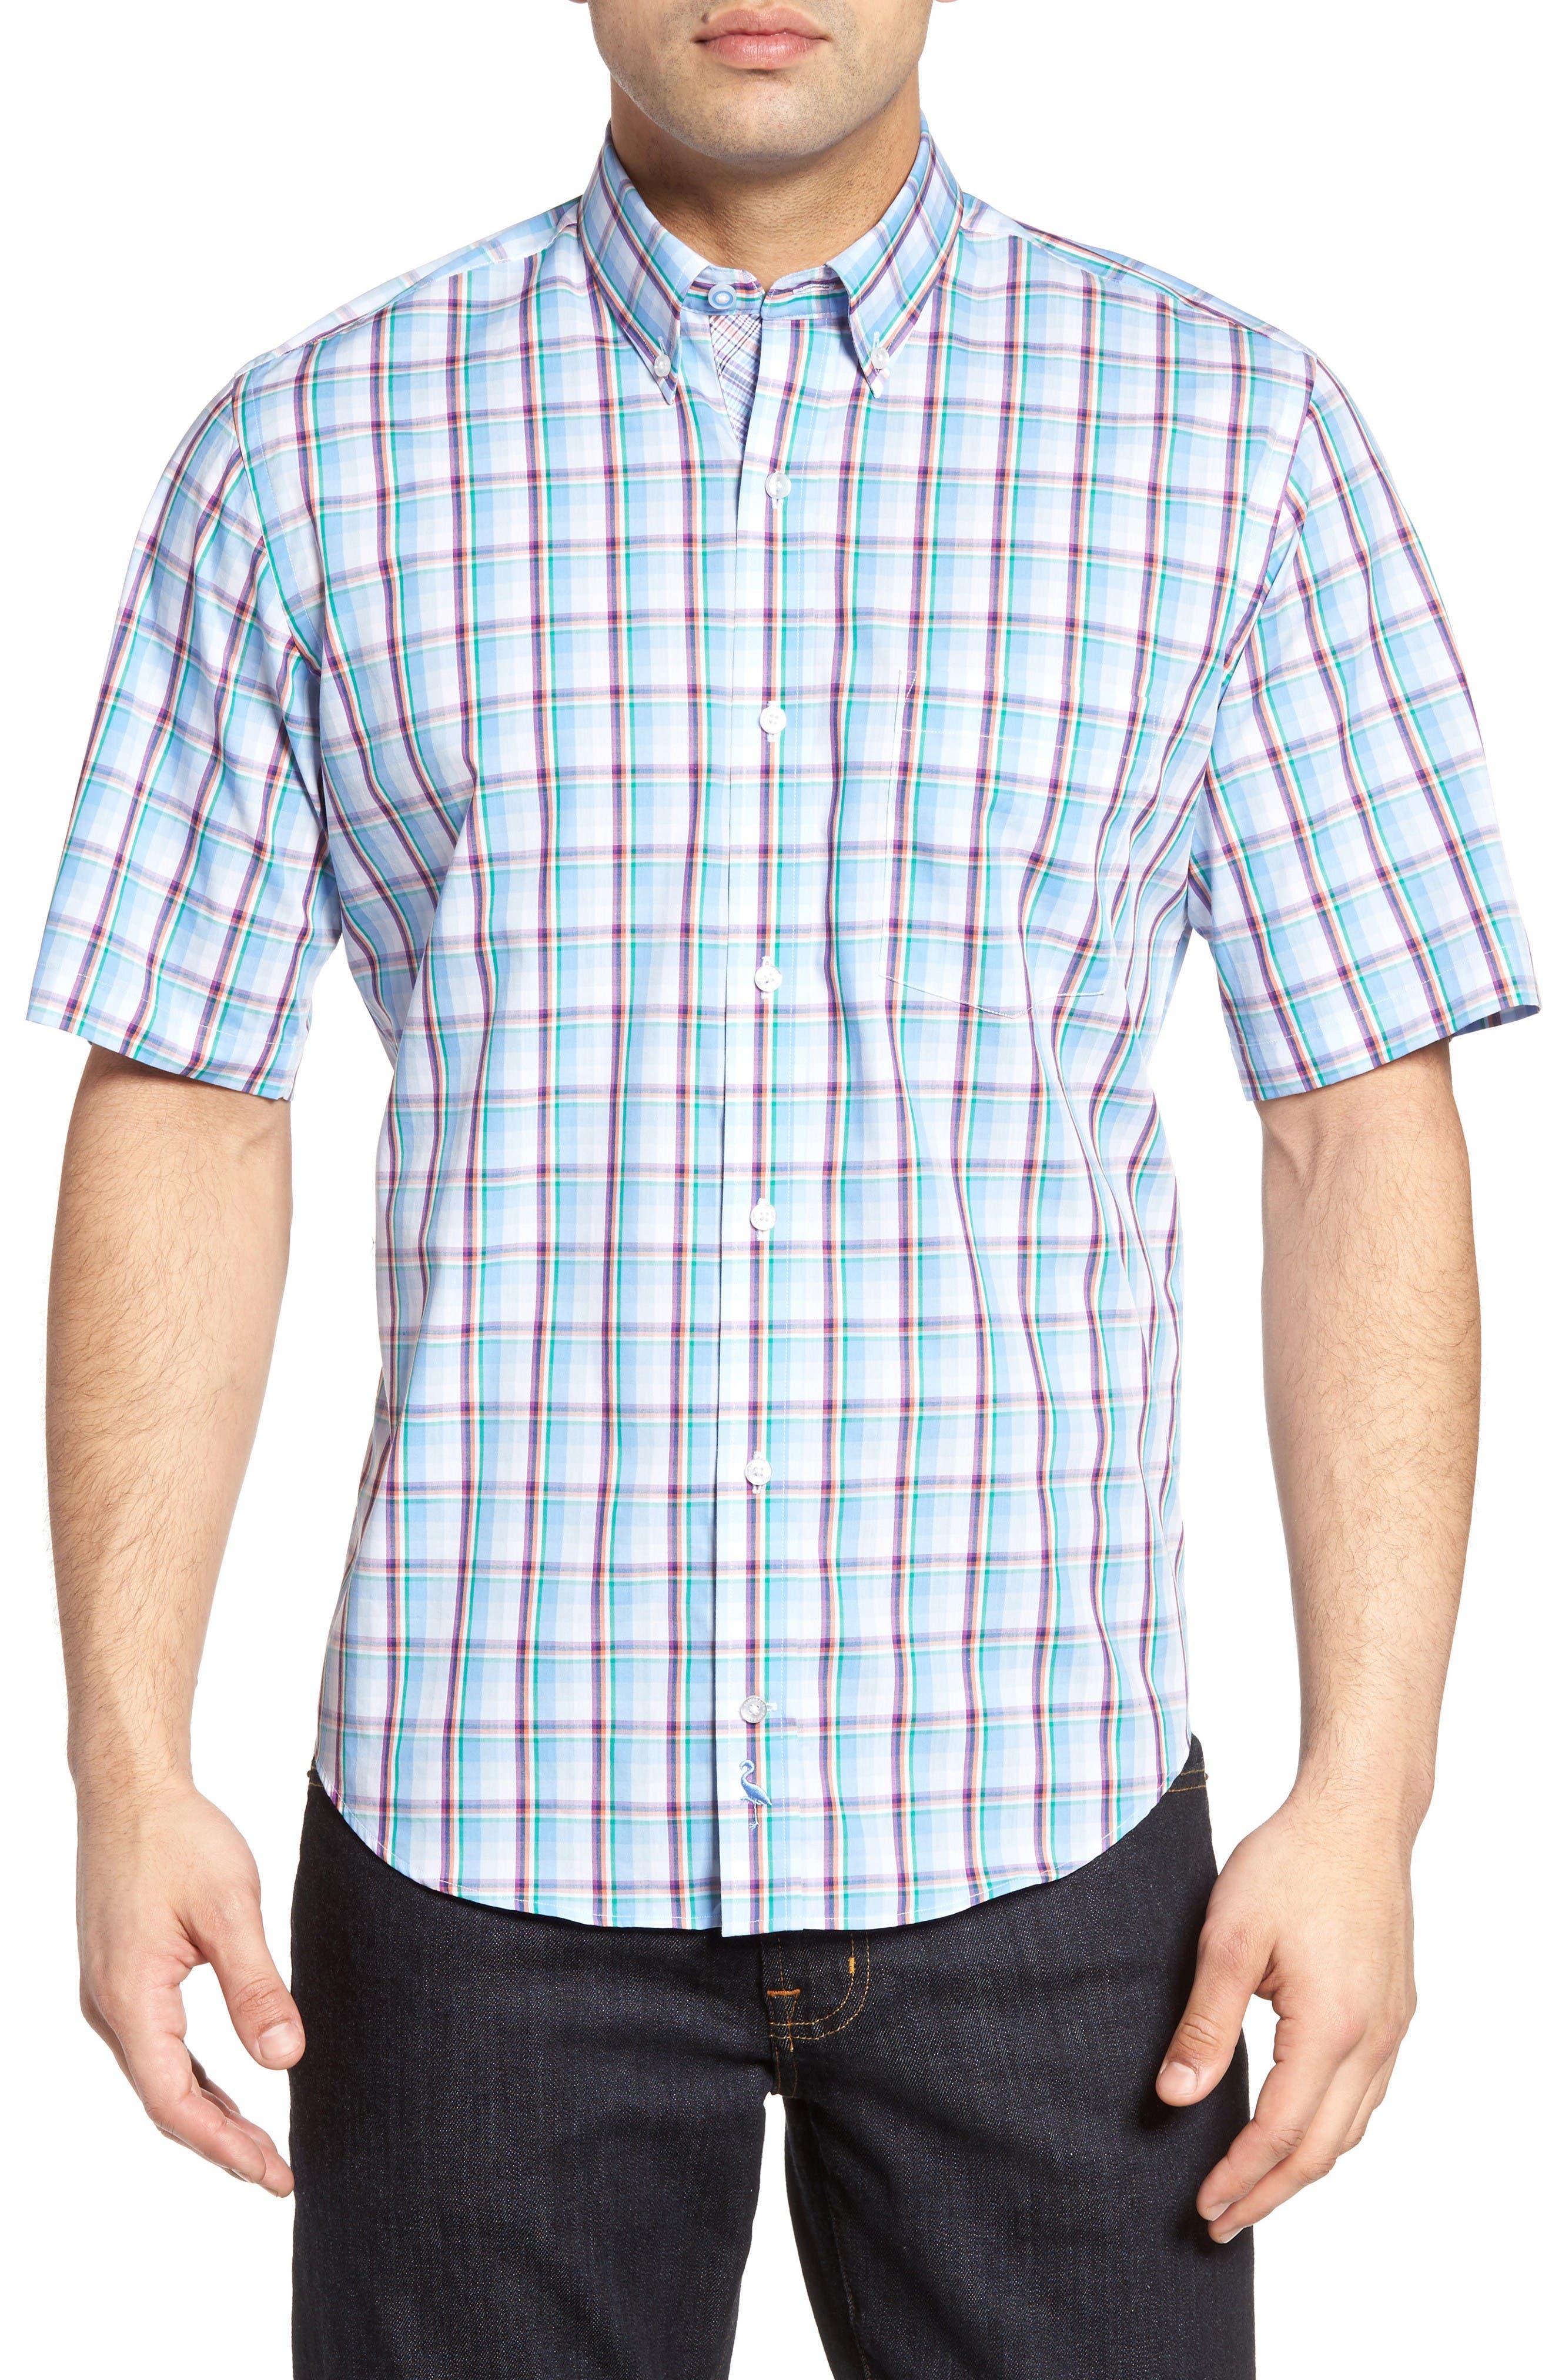 TailorByrd Pinyon Plaid Sport Shirt (Big & Tall)